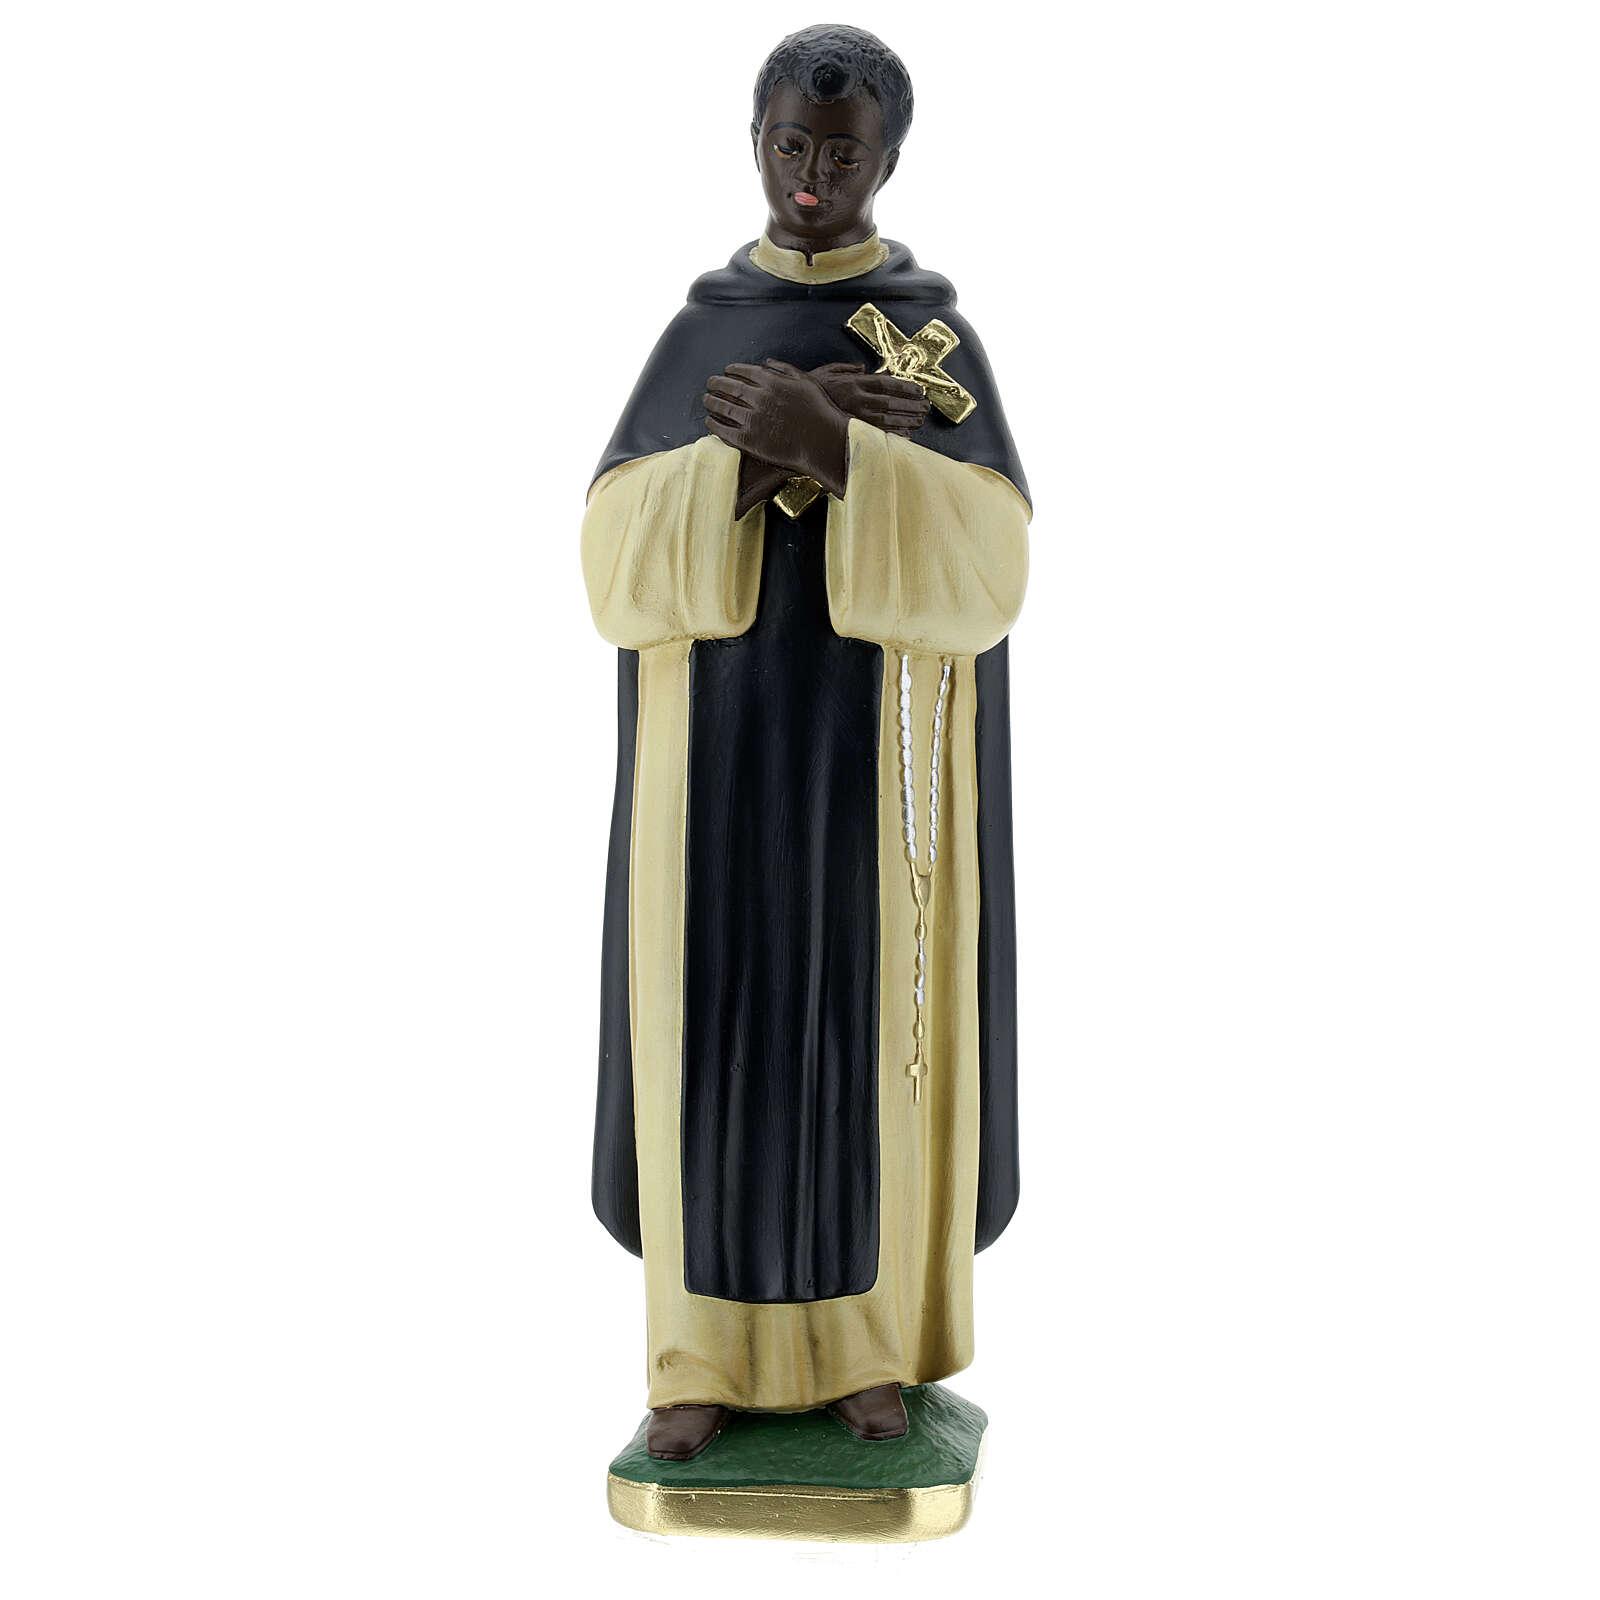 Statuetta San Martin de Porres 30 cm gesso dipinta a mano Barsanti 4